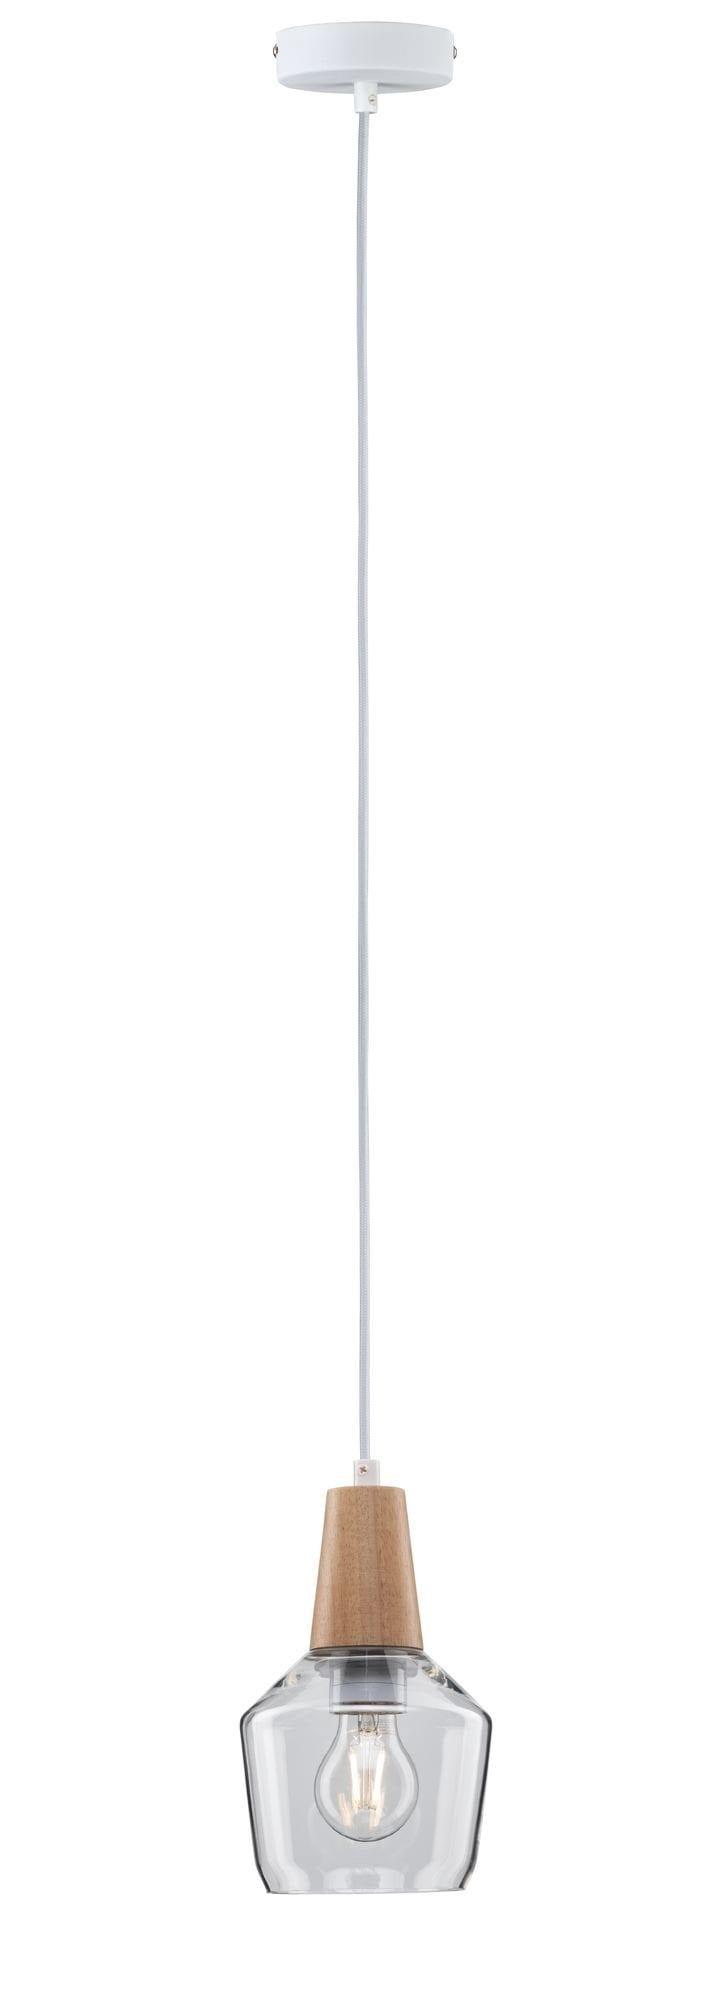 Paulmann,LED Pendelleuchte Neordic Yva Glas/Holz max. 20W E27